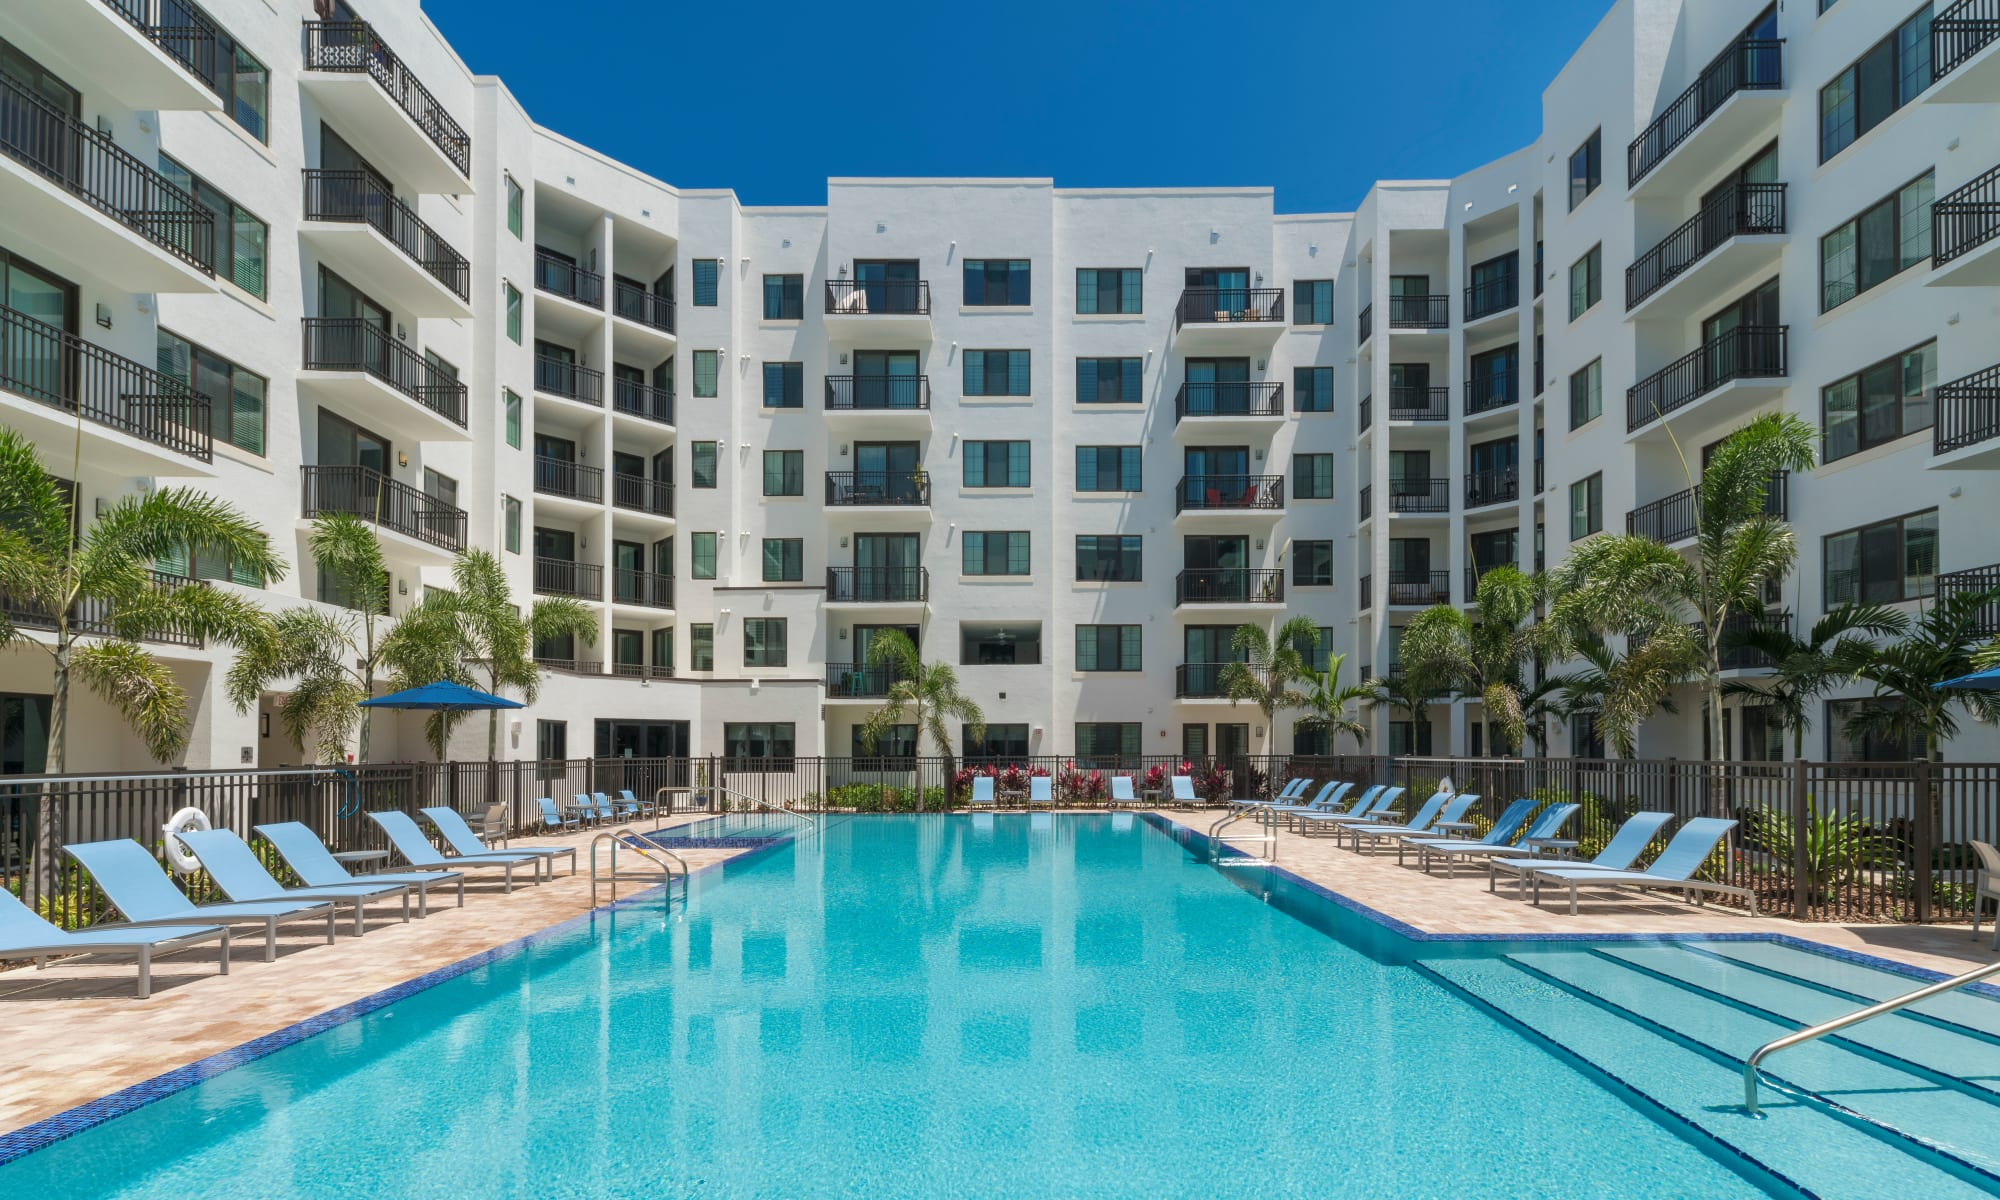 Boynton Beach Fl Apartments For Rent Near Ocean Ridge 500